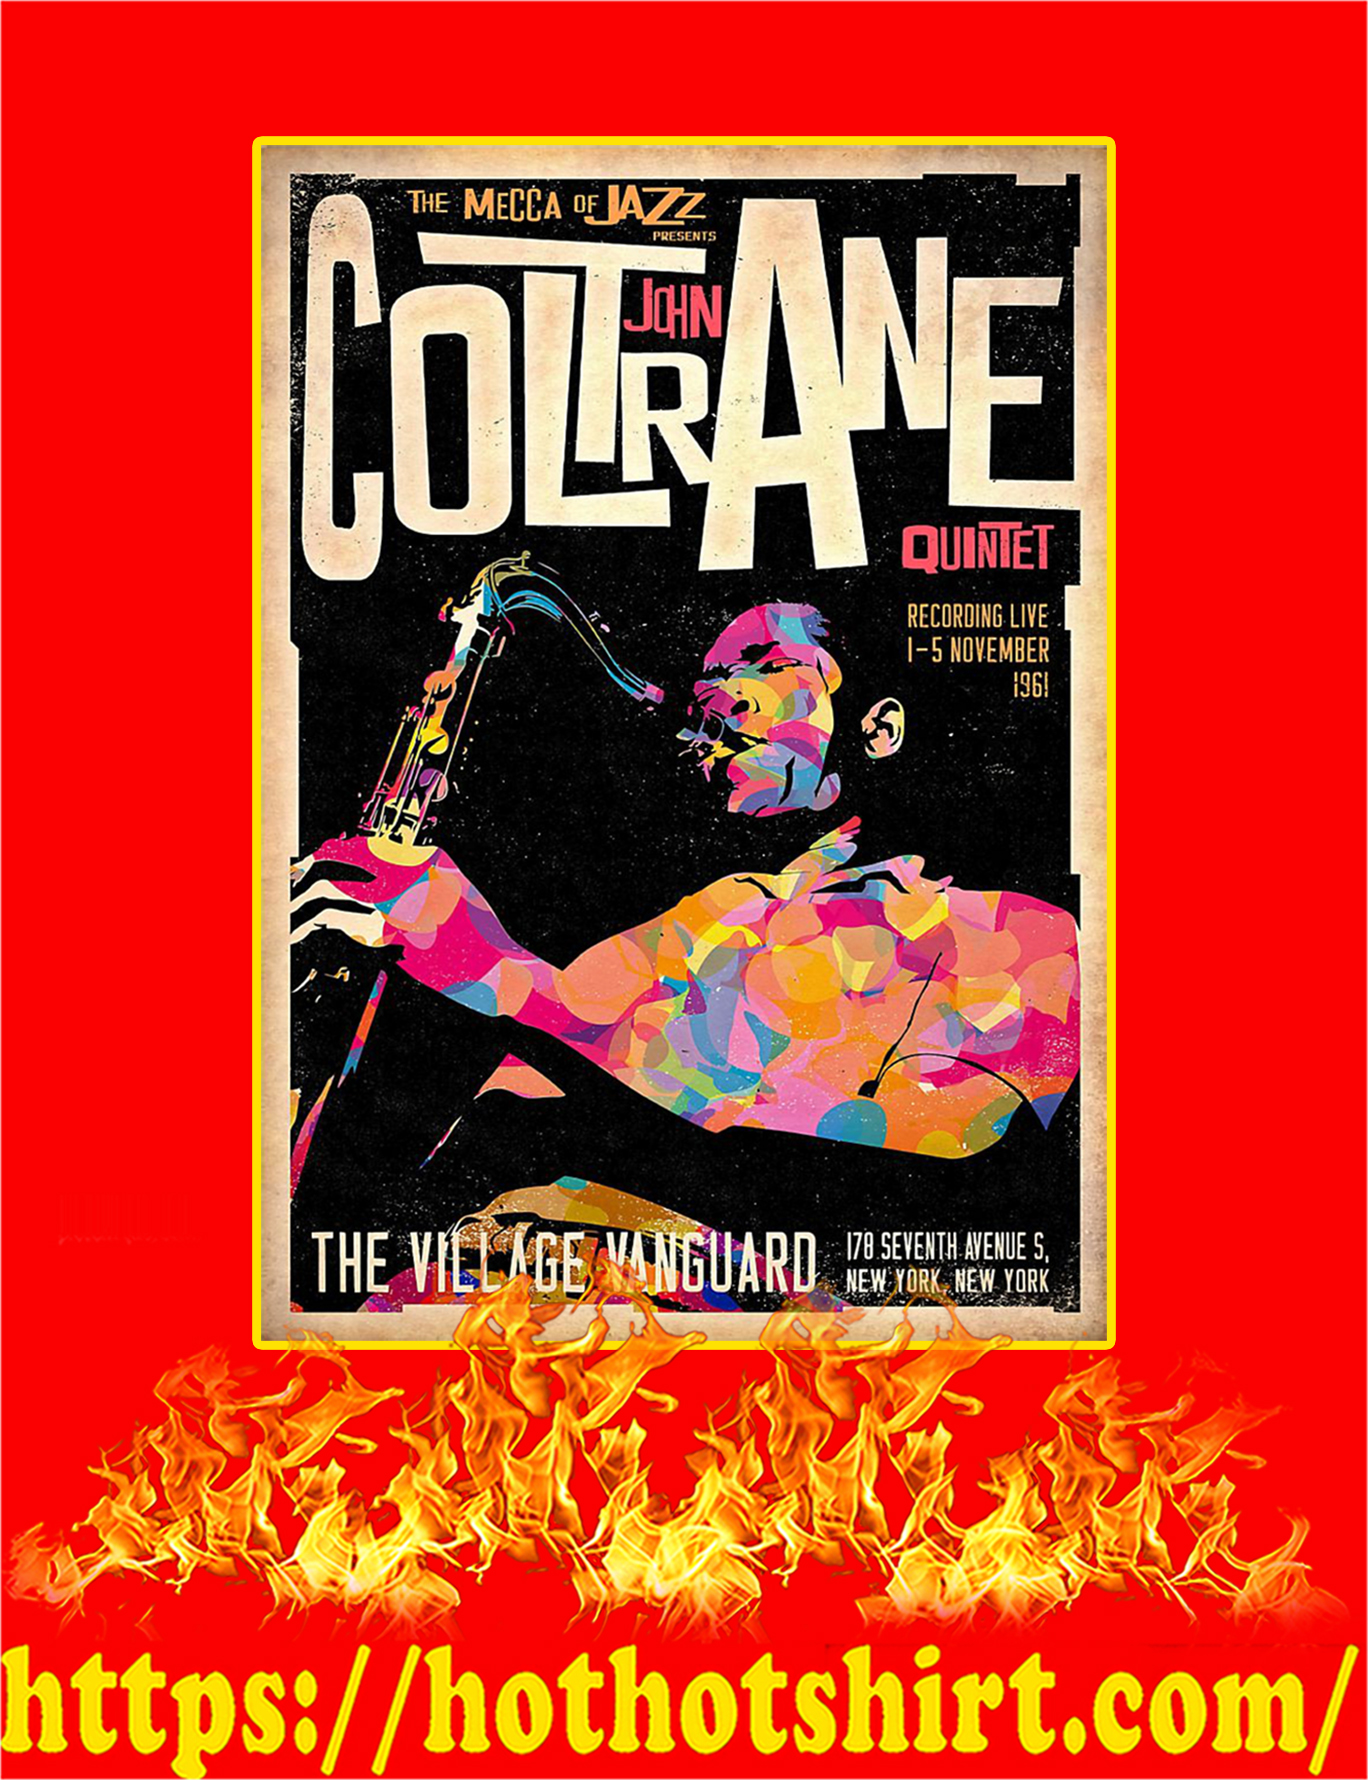 John Coltrane Quintet Poster - A3